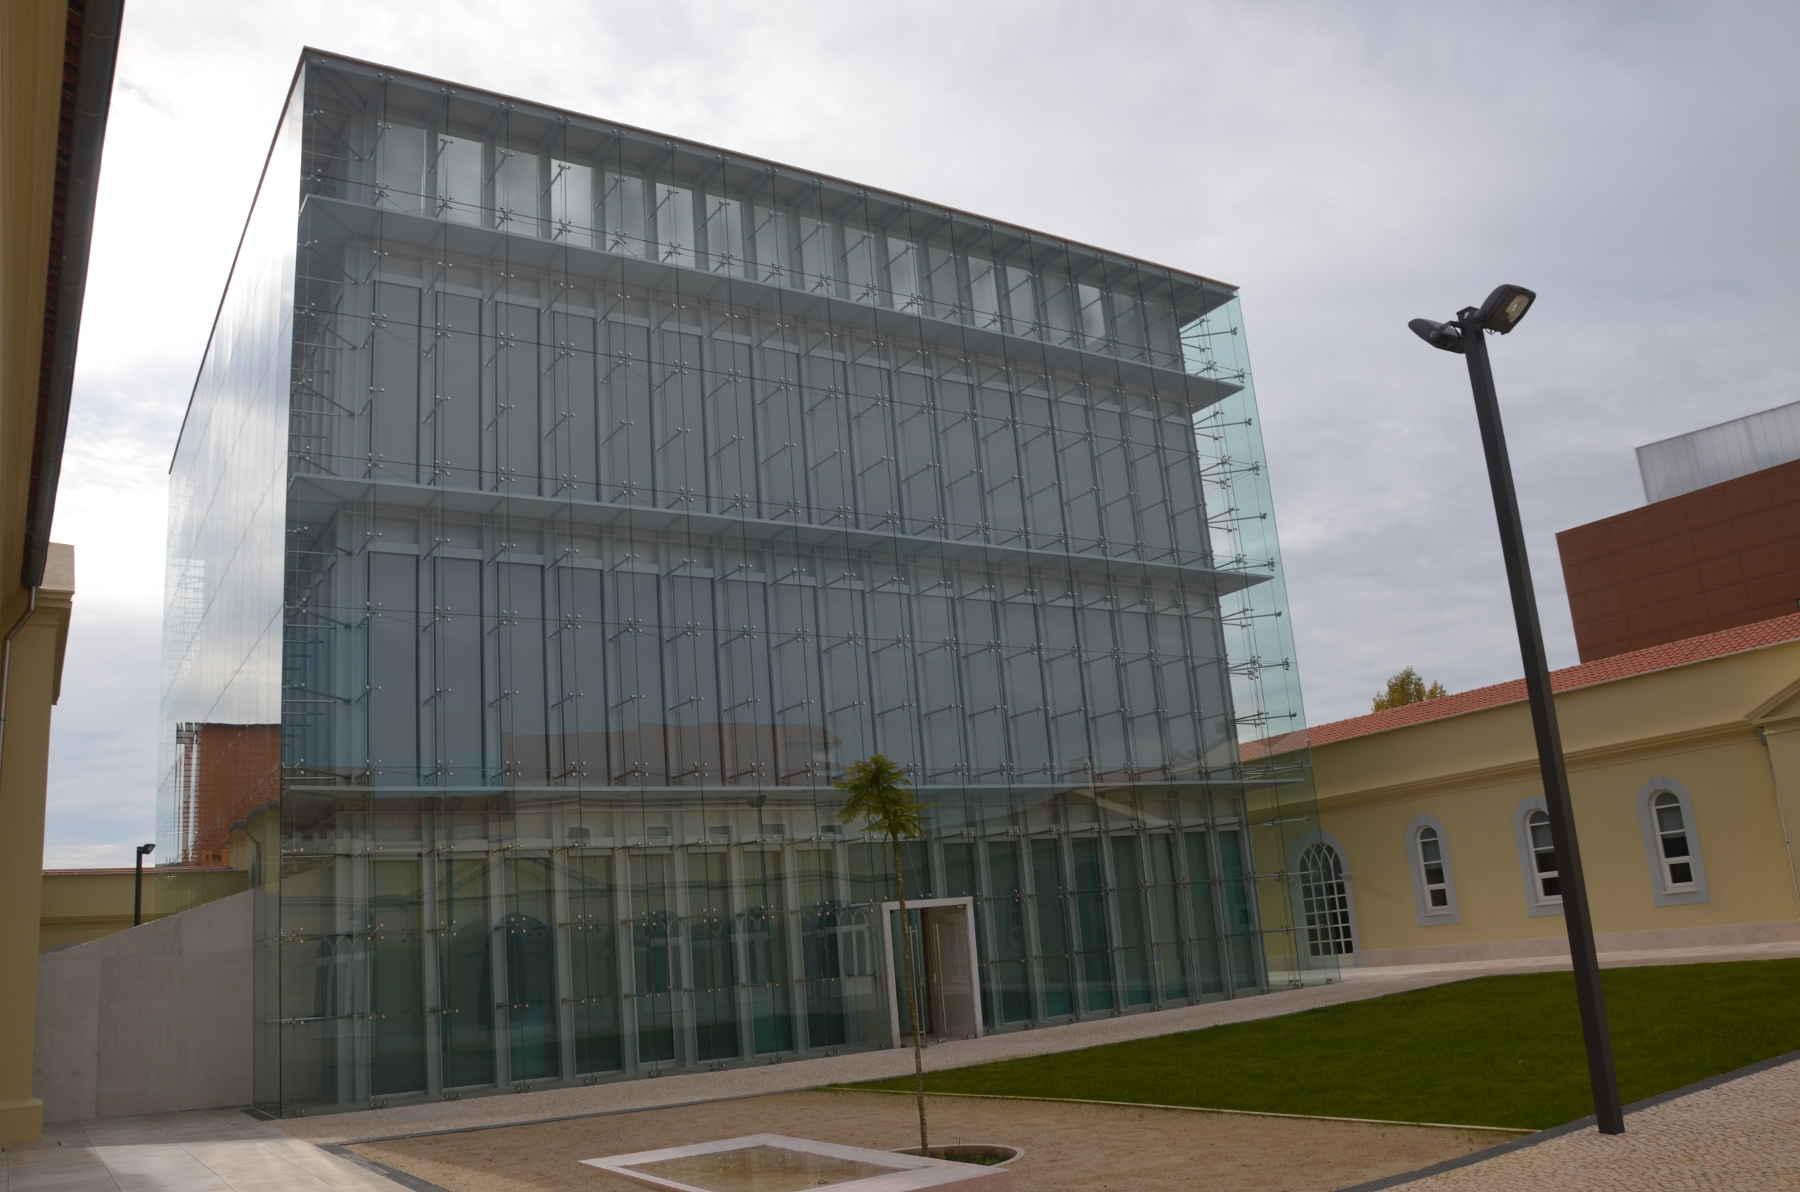 Fitechnic Museu do Vidro